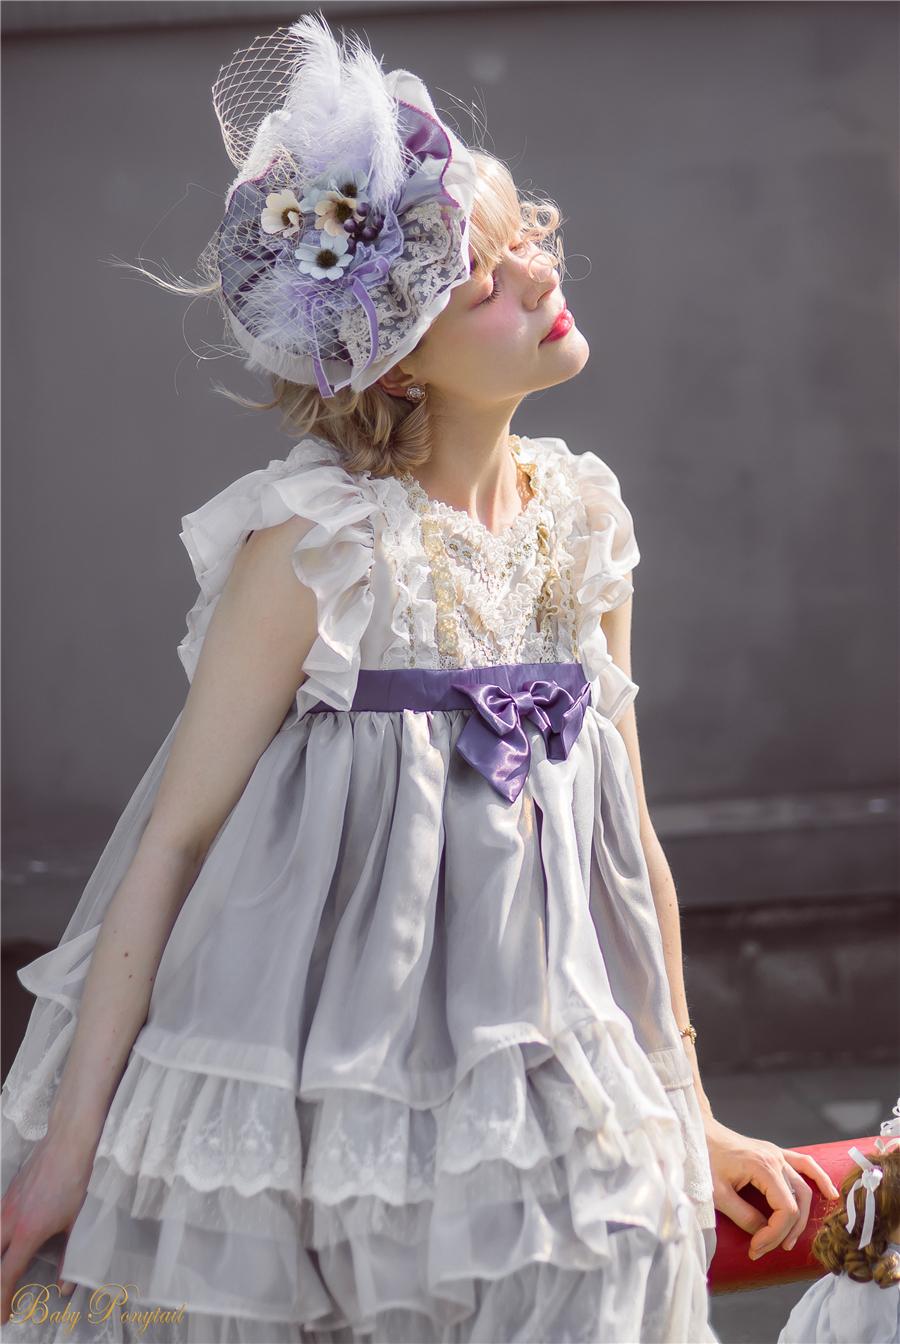 Babyponytail_Present Angel_JSK_Claudia8.jpg